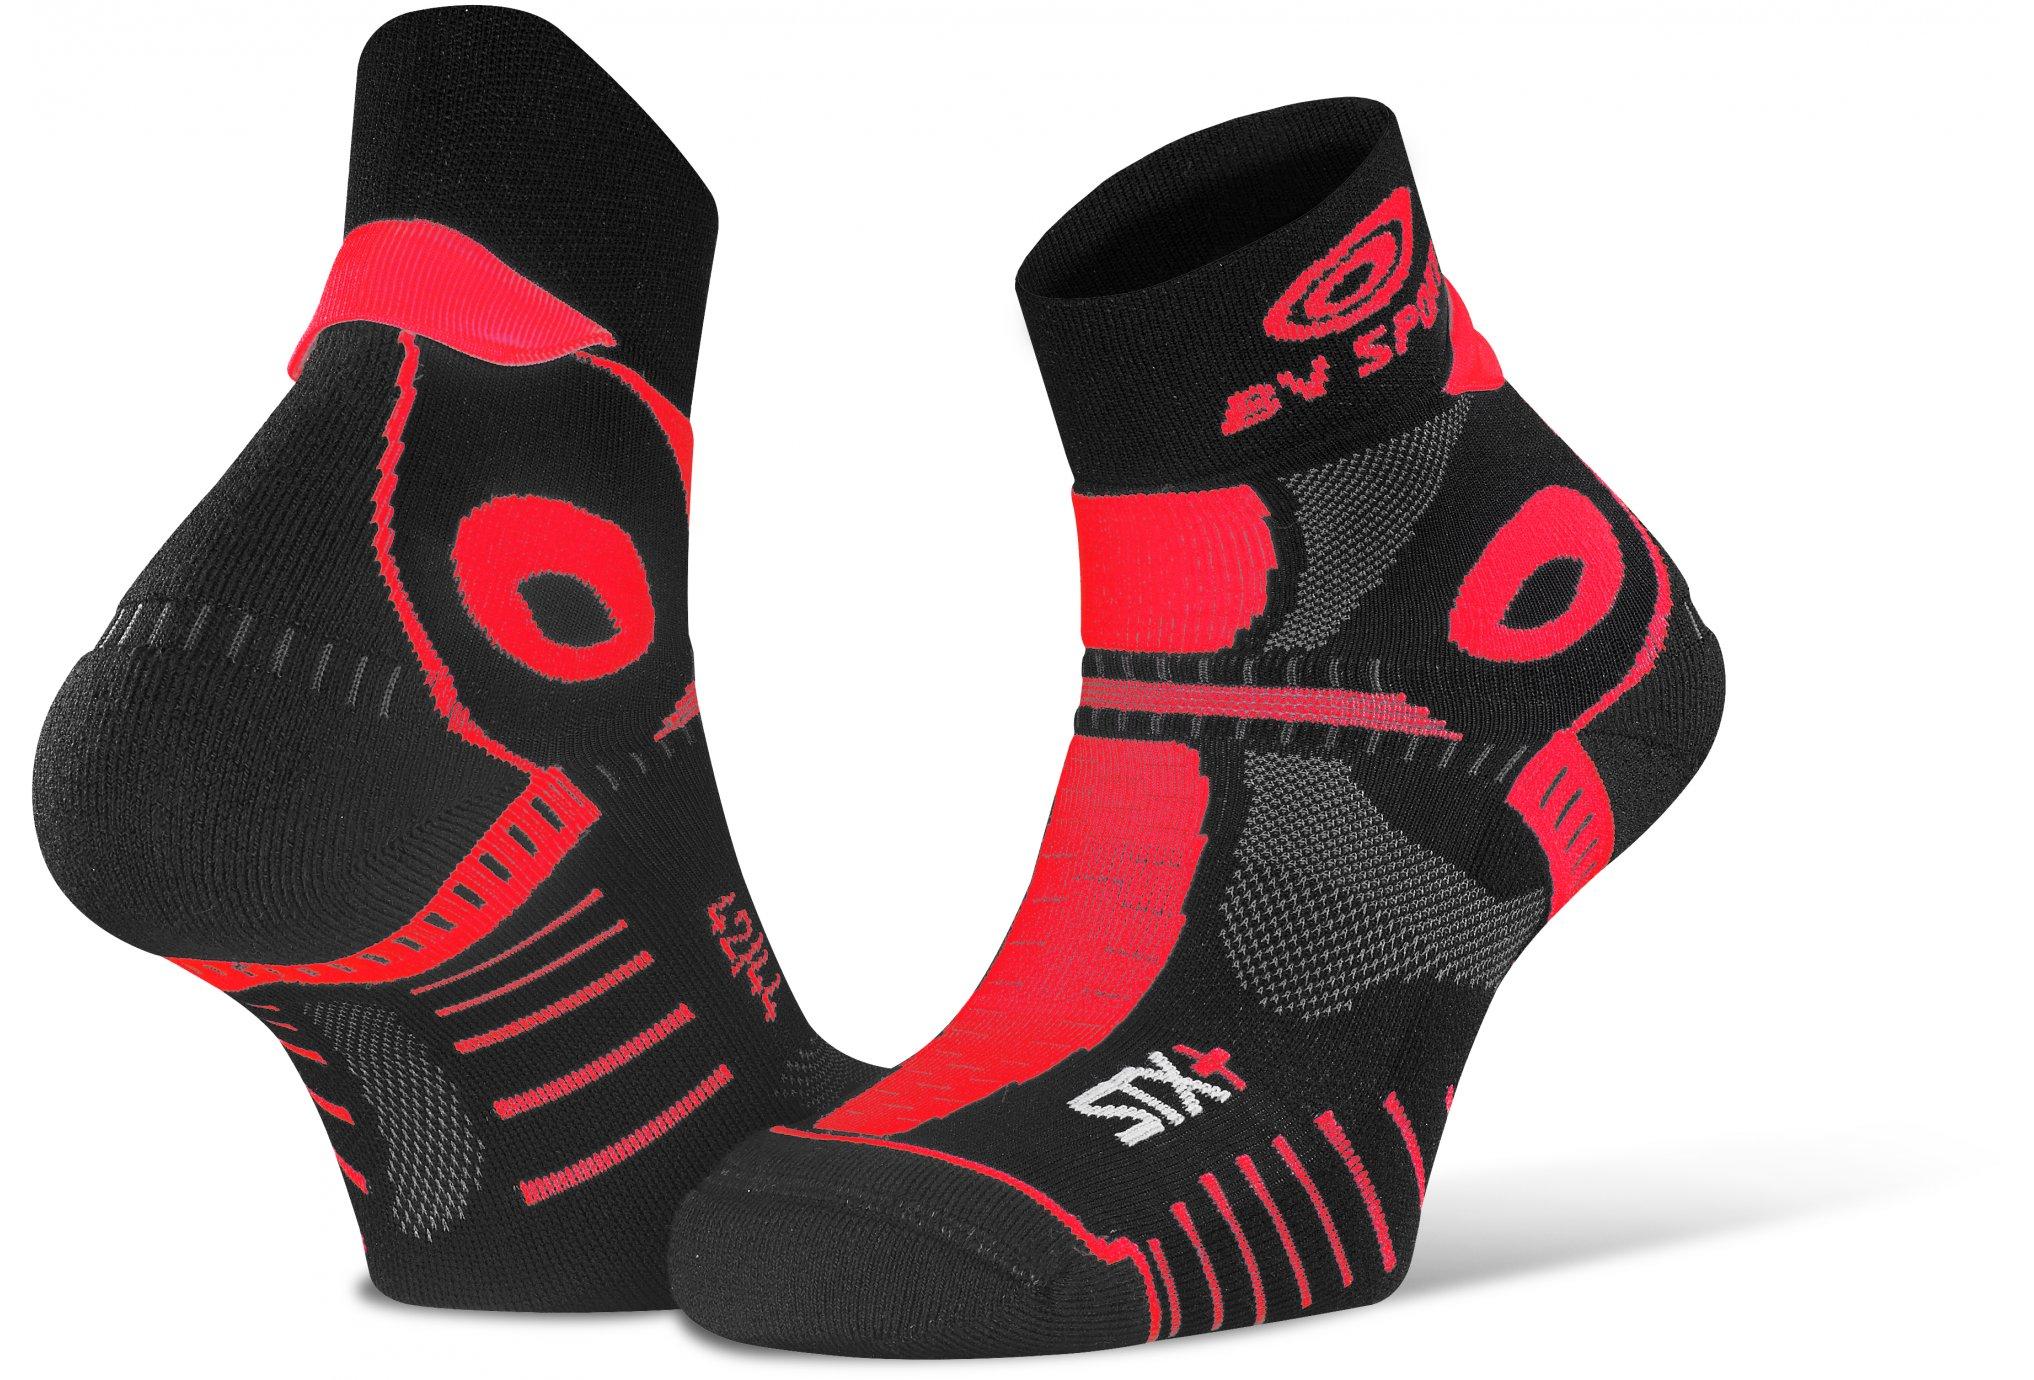 BV Sport STX+ Evo Chaussettes